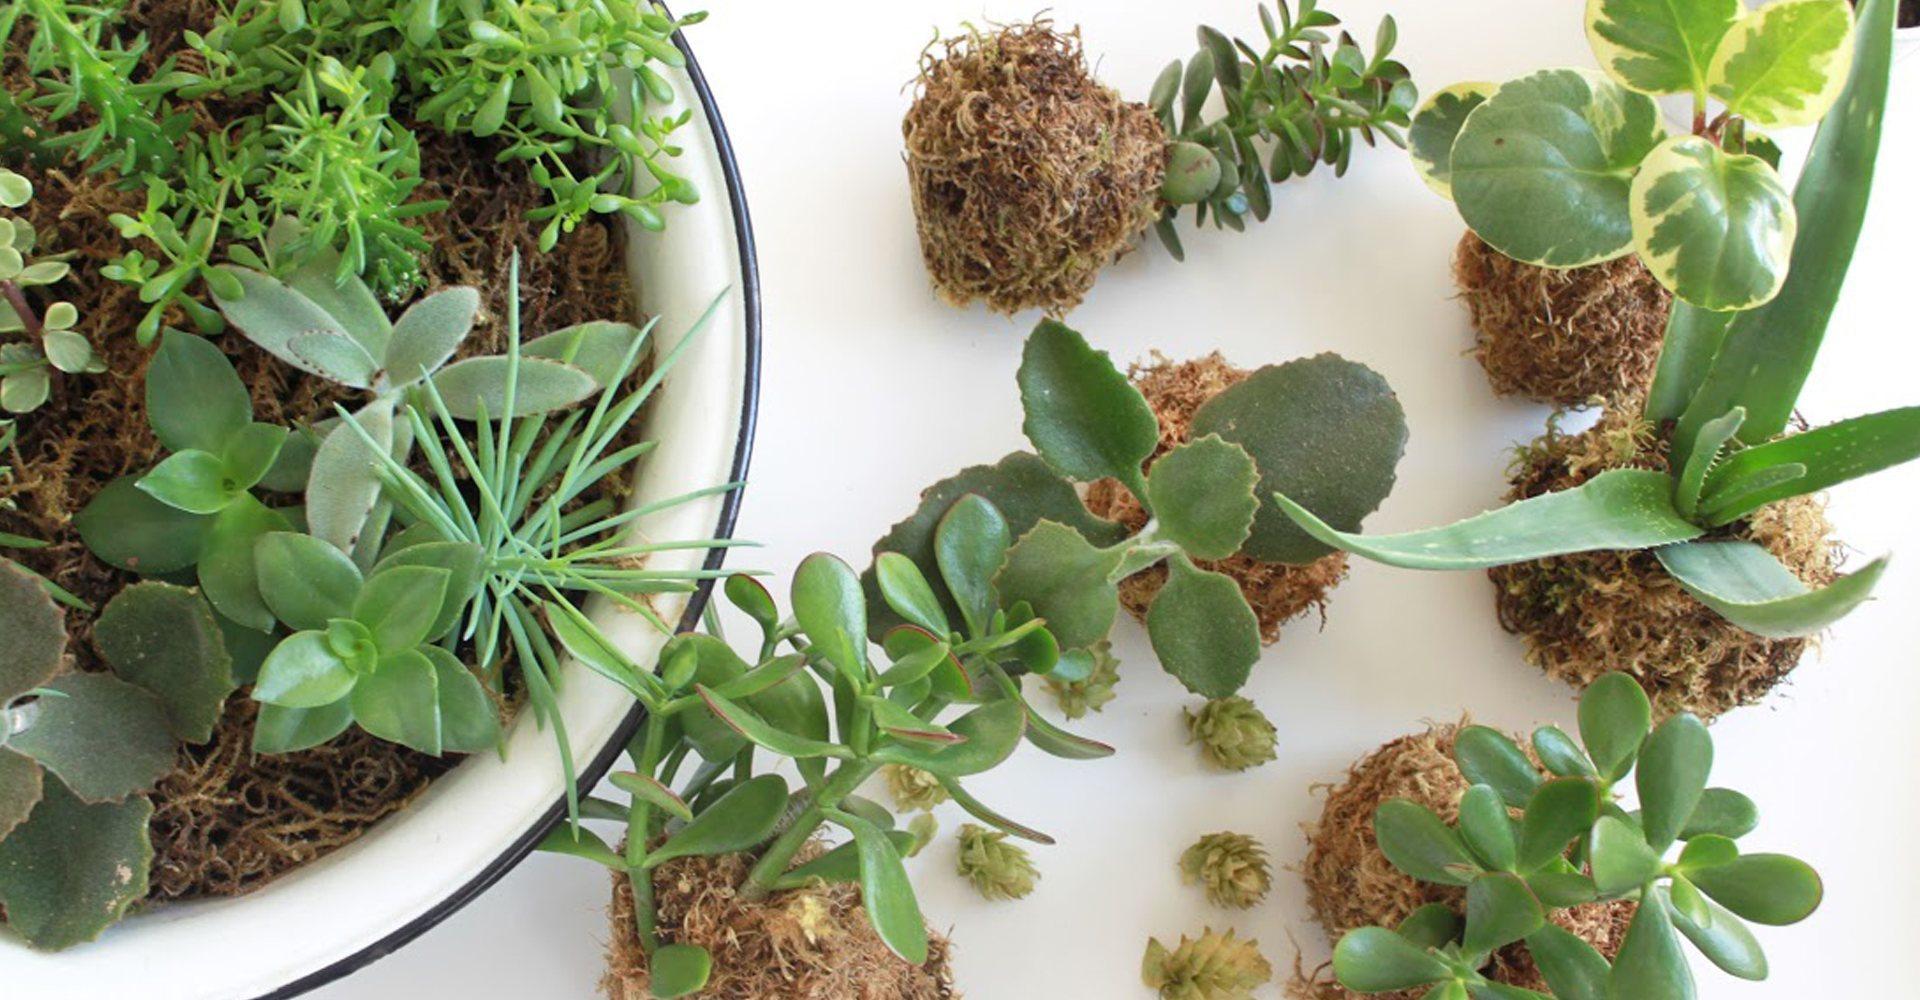 Botanical Photography Workshop with La Fleur Kitchen